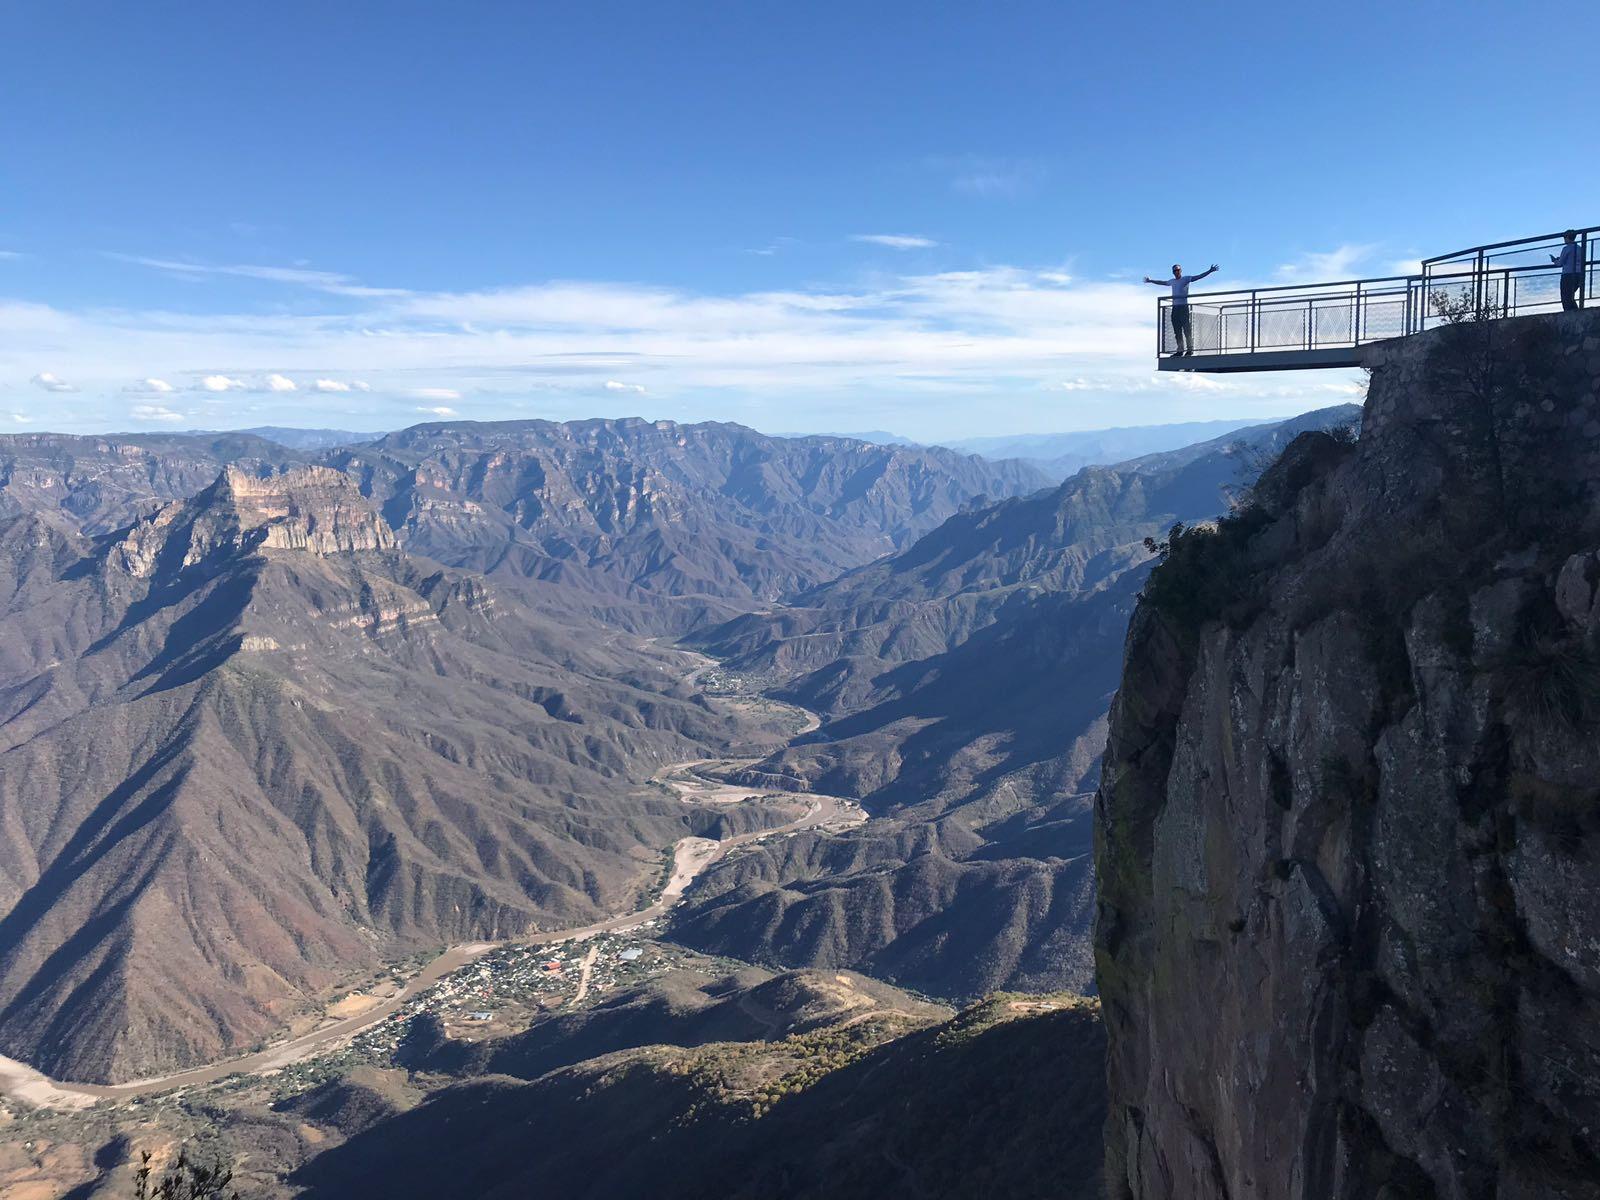 The Copper Canyon - site of the Tarahumara ultra-marathon race.